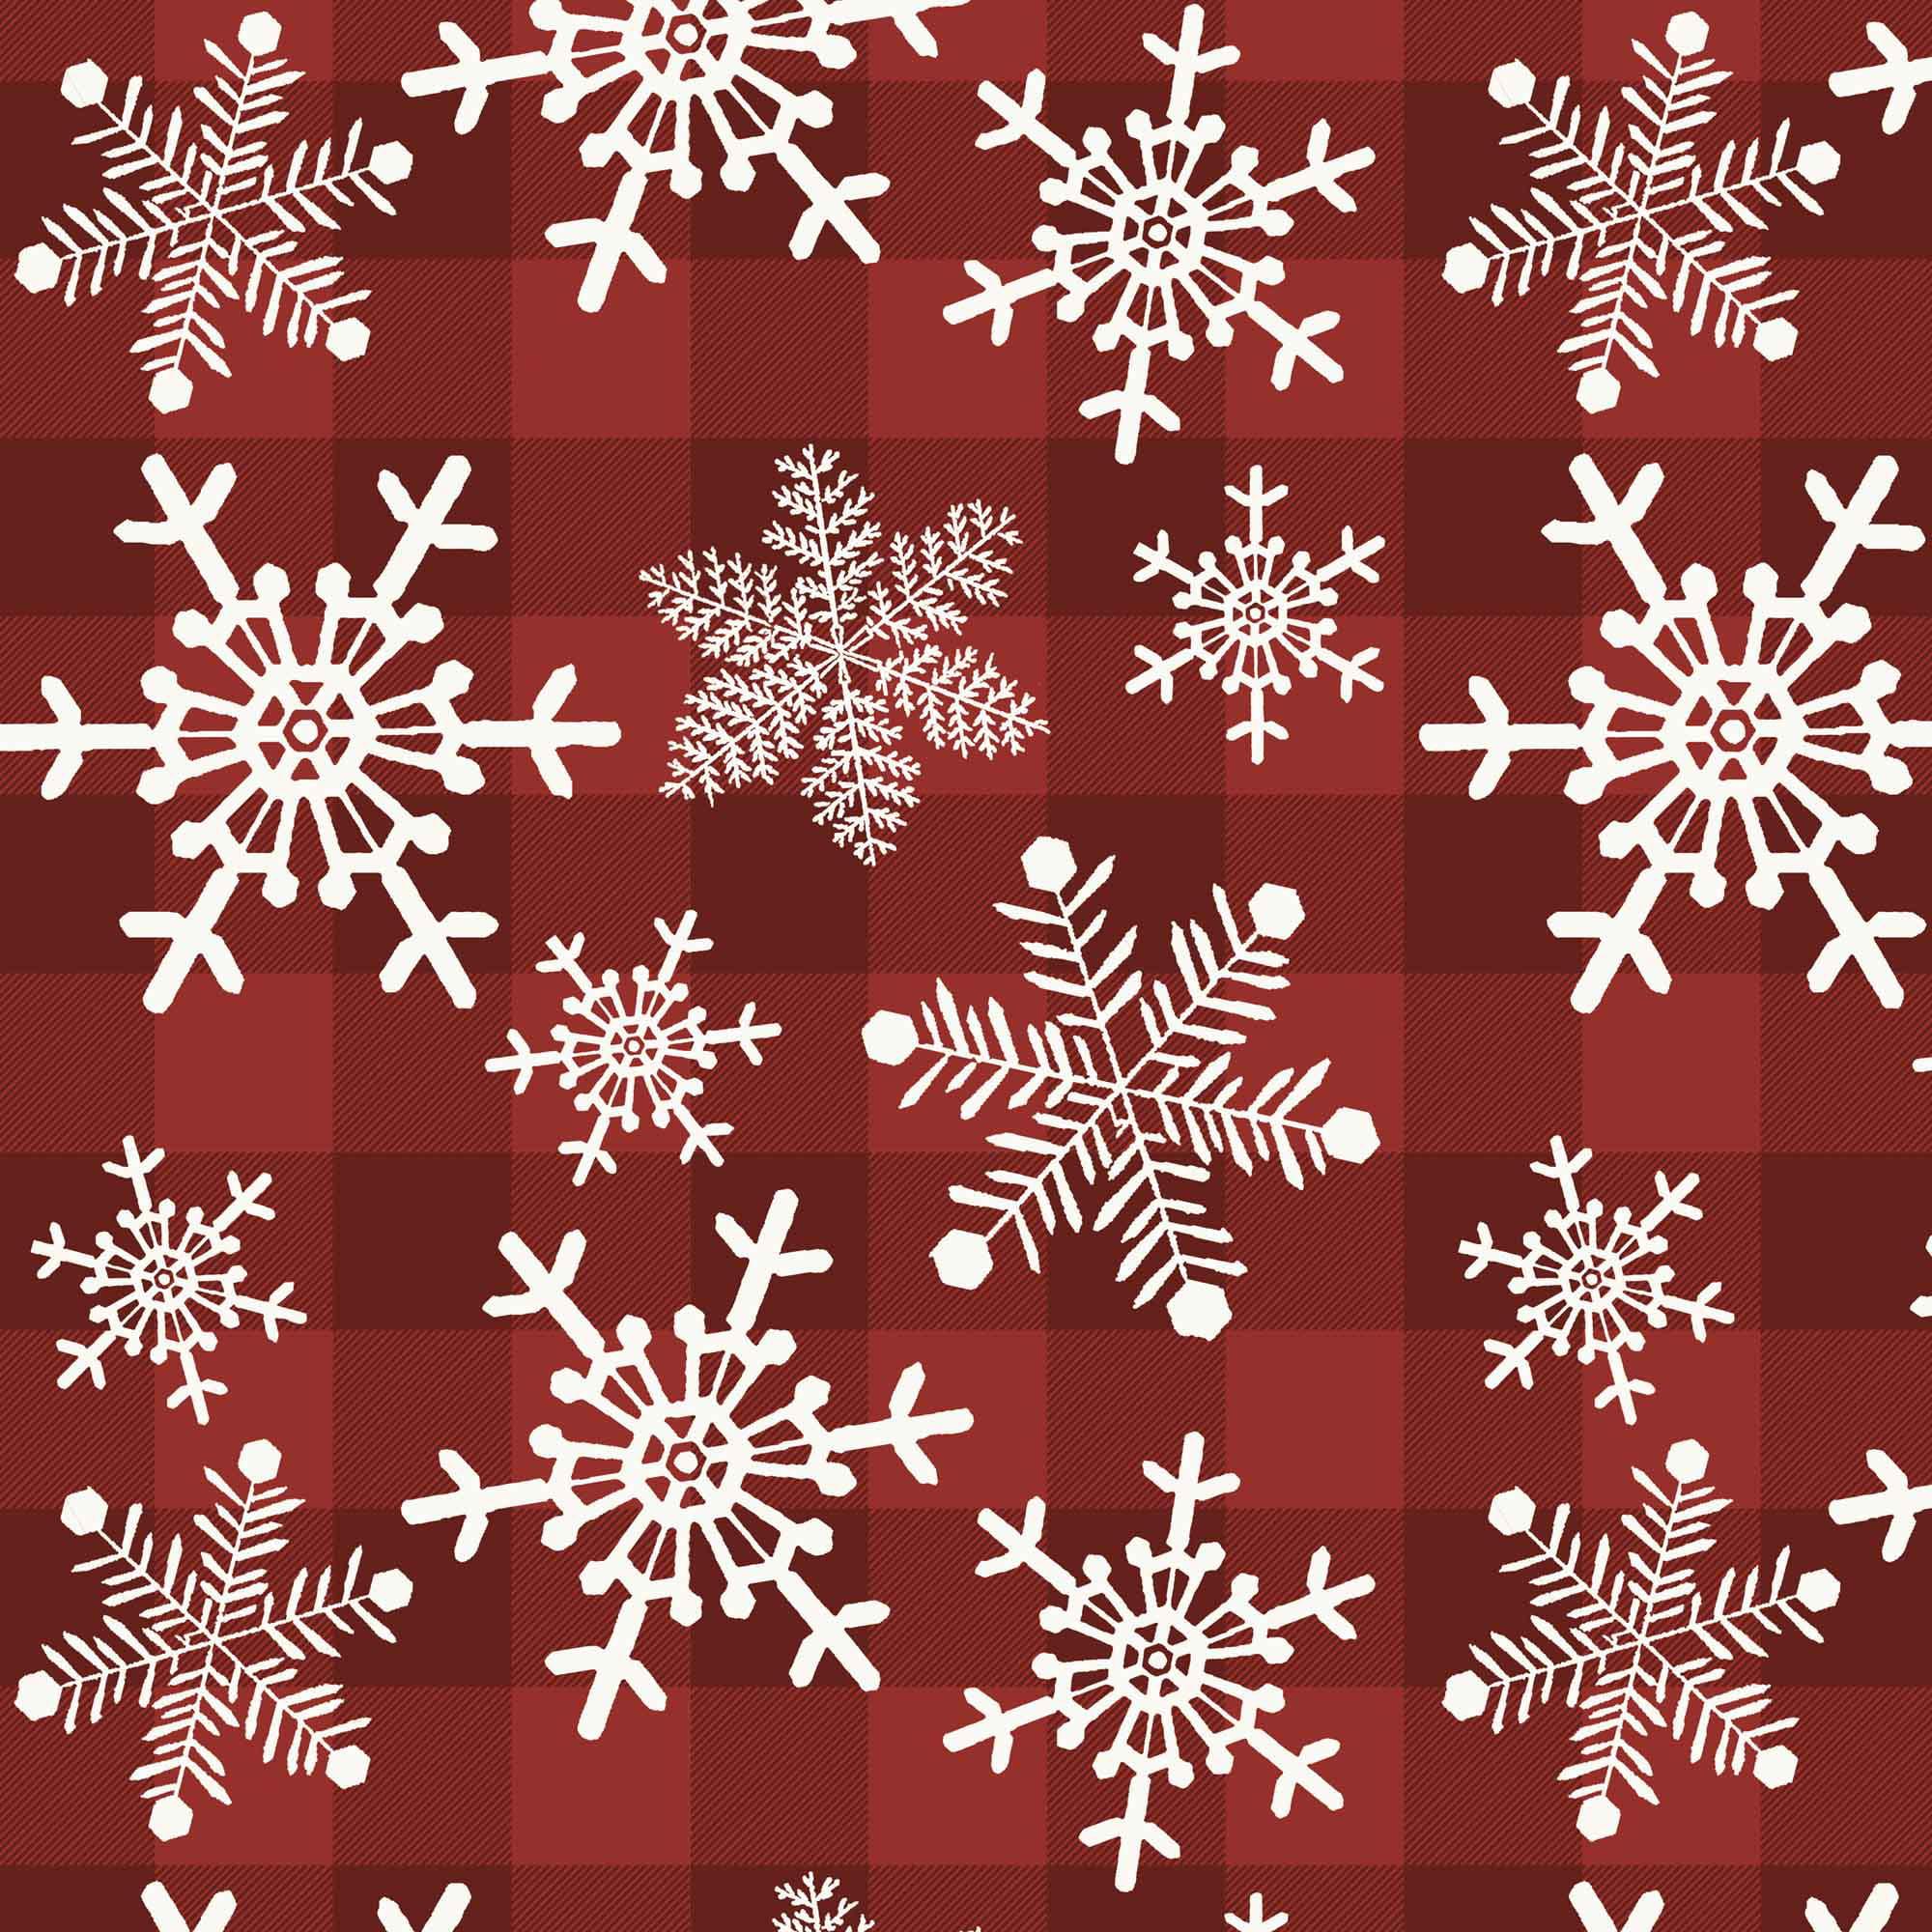 David Textiles Snowflakes Gingham Cotton Fabric, per Yard